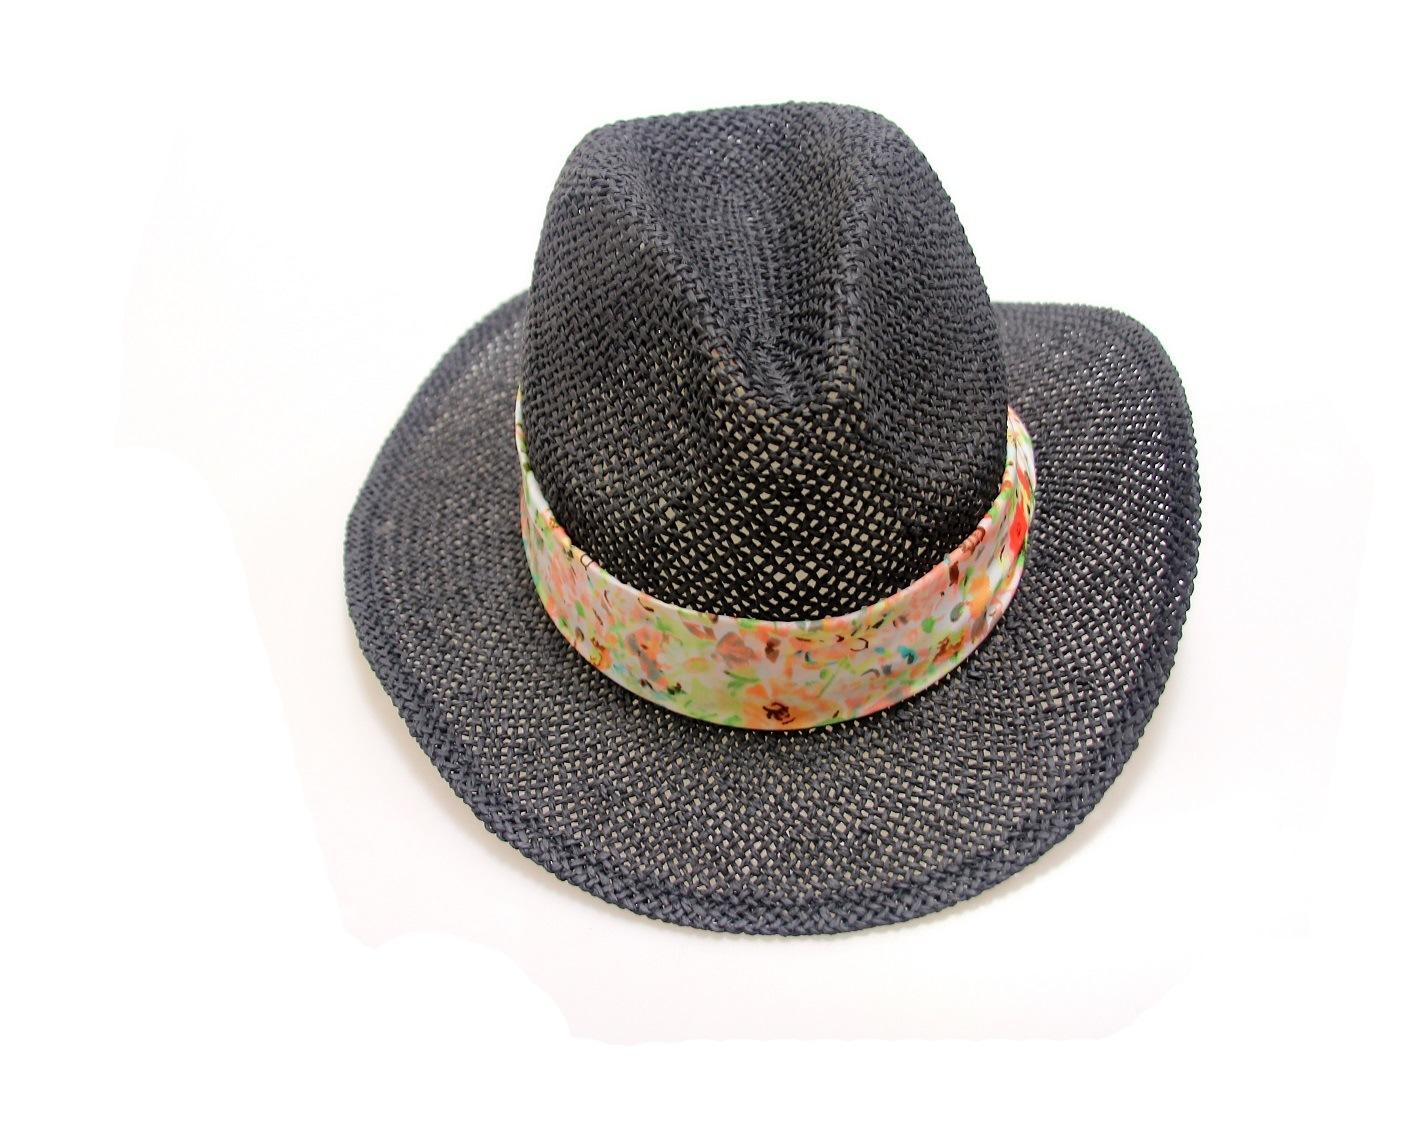 e23f61f89 [Hot Item] Fashion Hats Promotional Unisex Straw Cowboy Hat